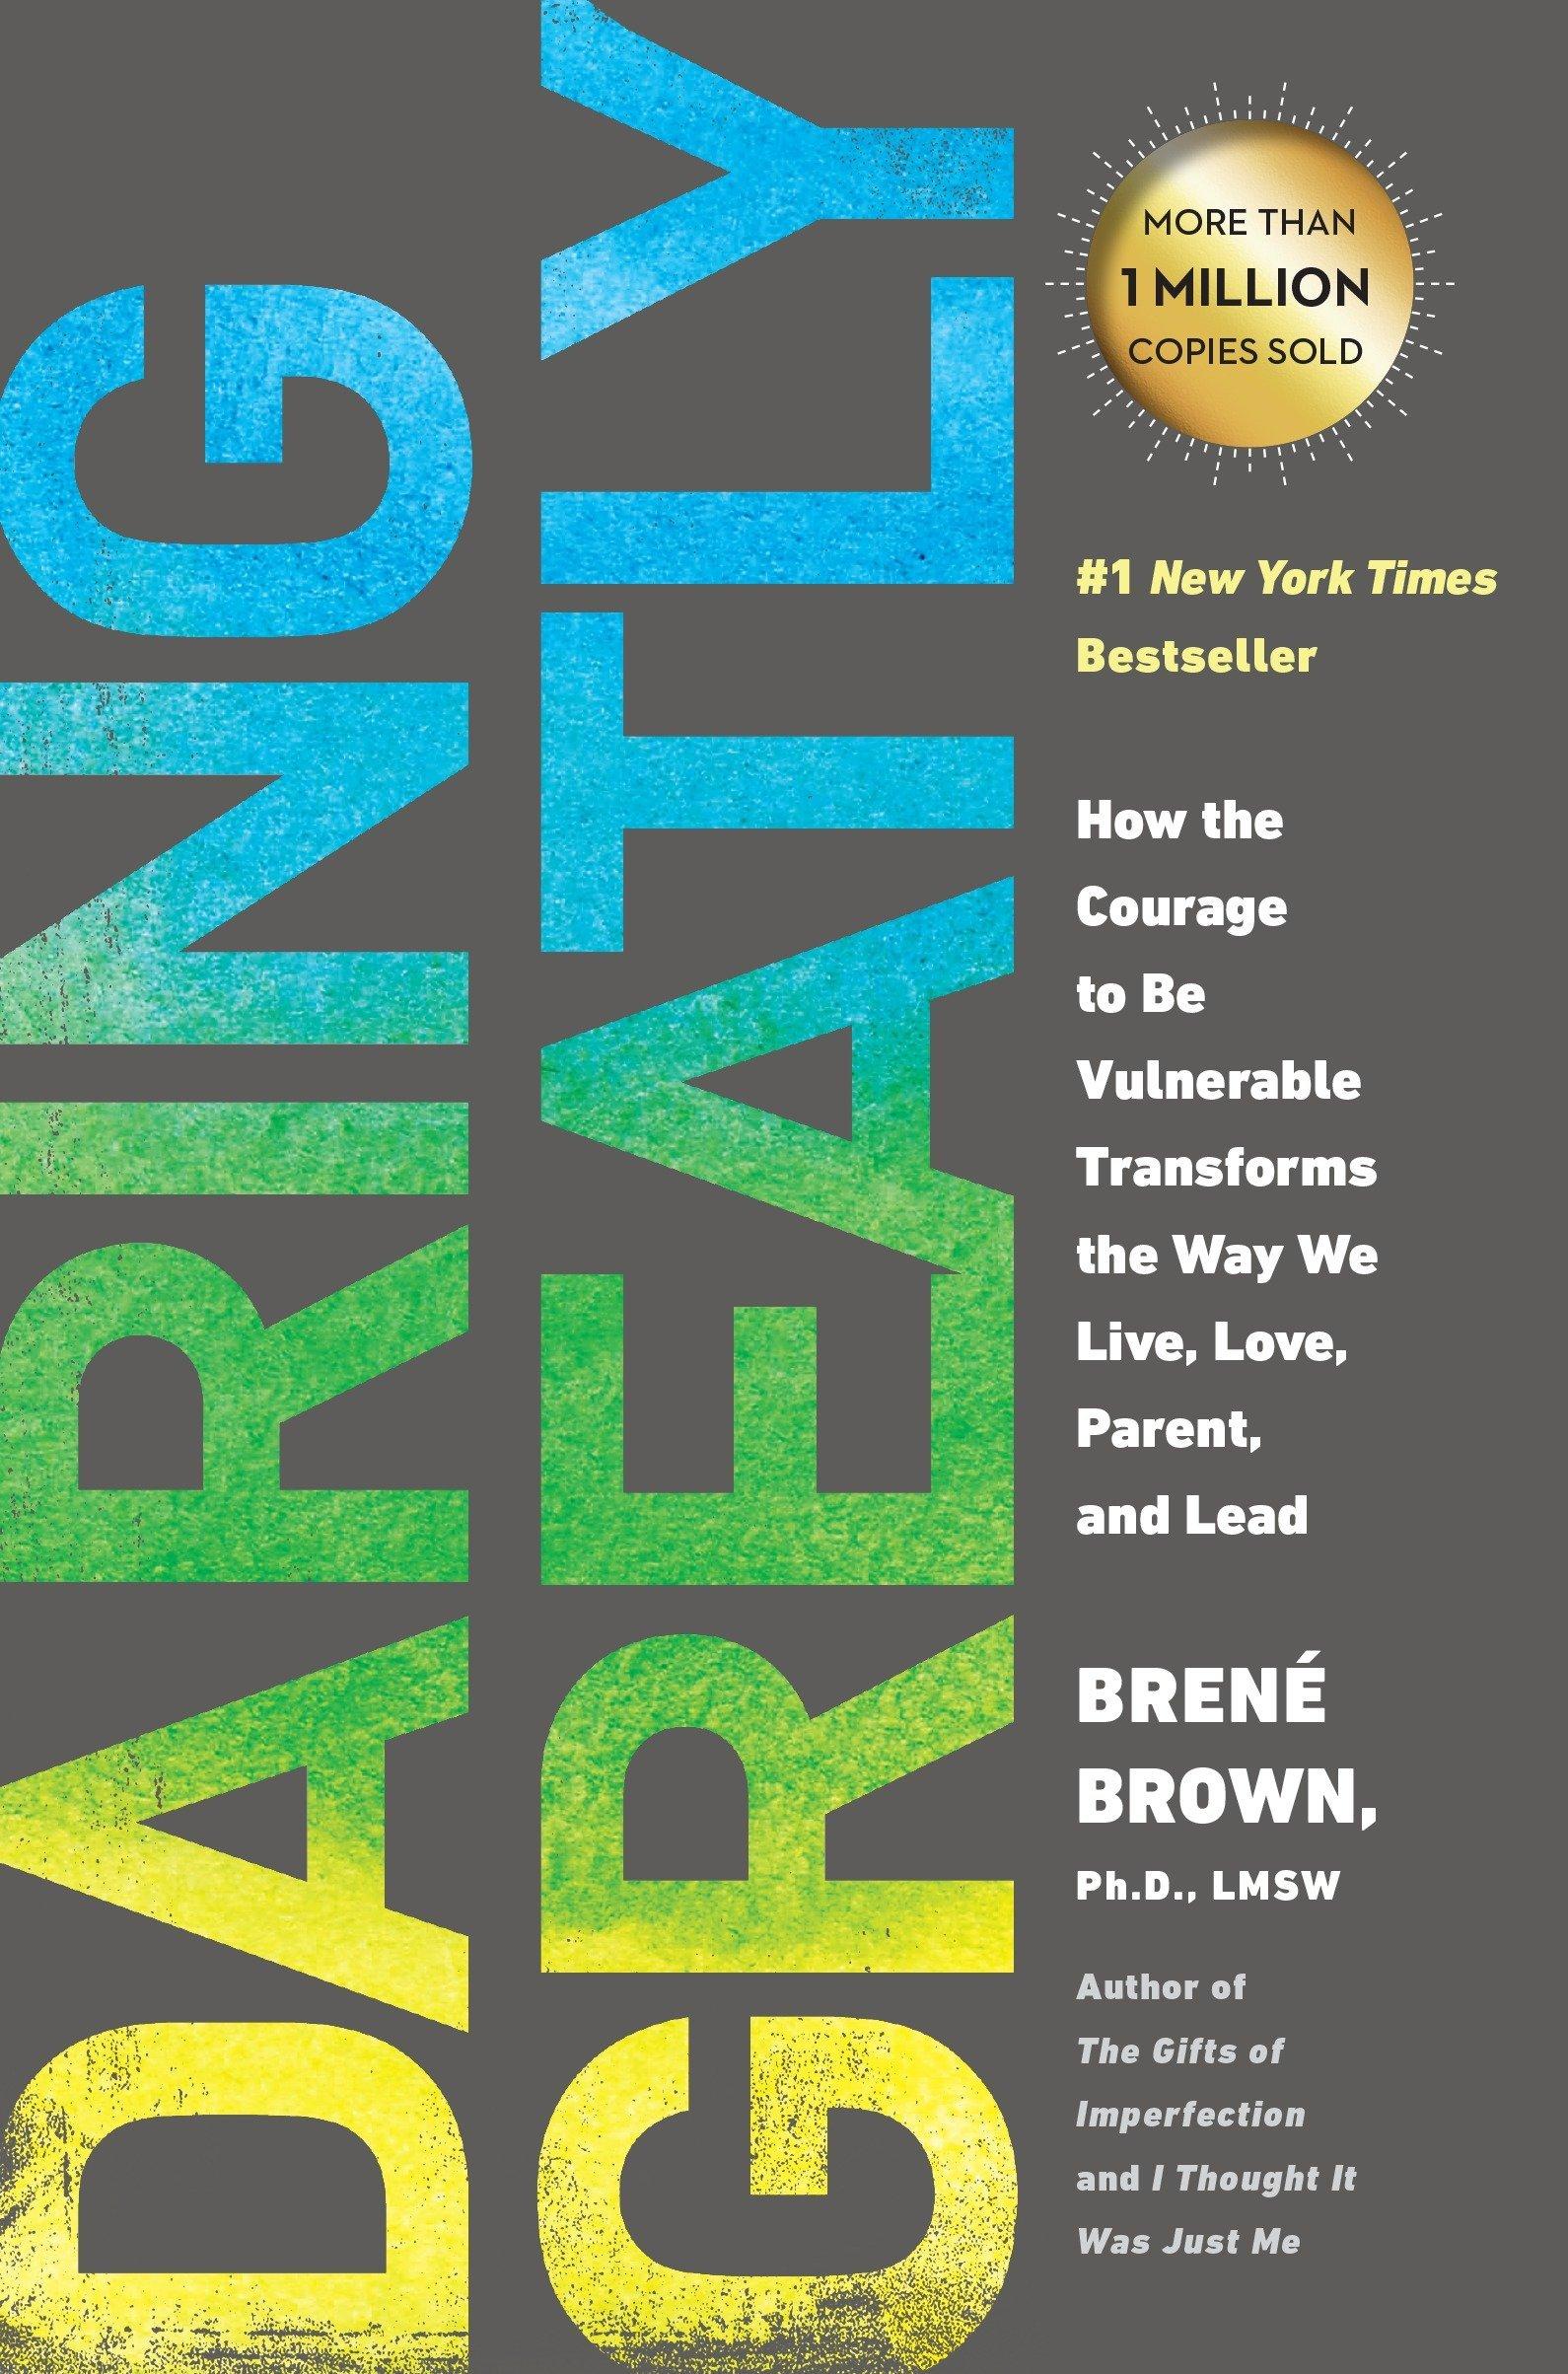 November 12 - Daring Greatly by Brené Brown[leaping forward]